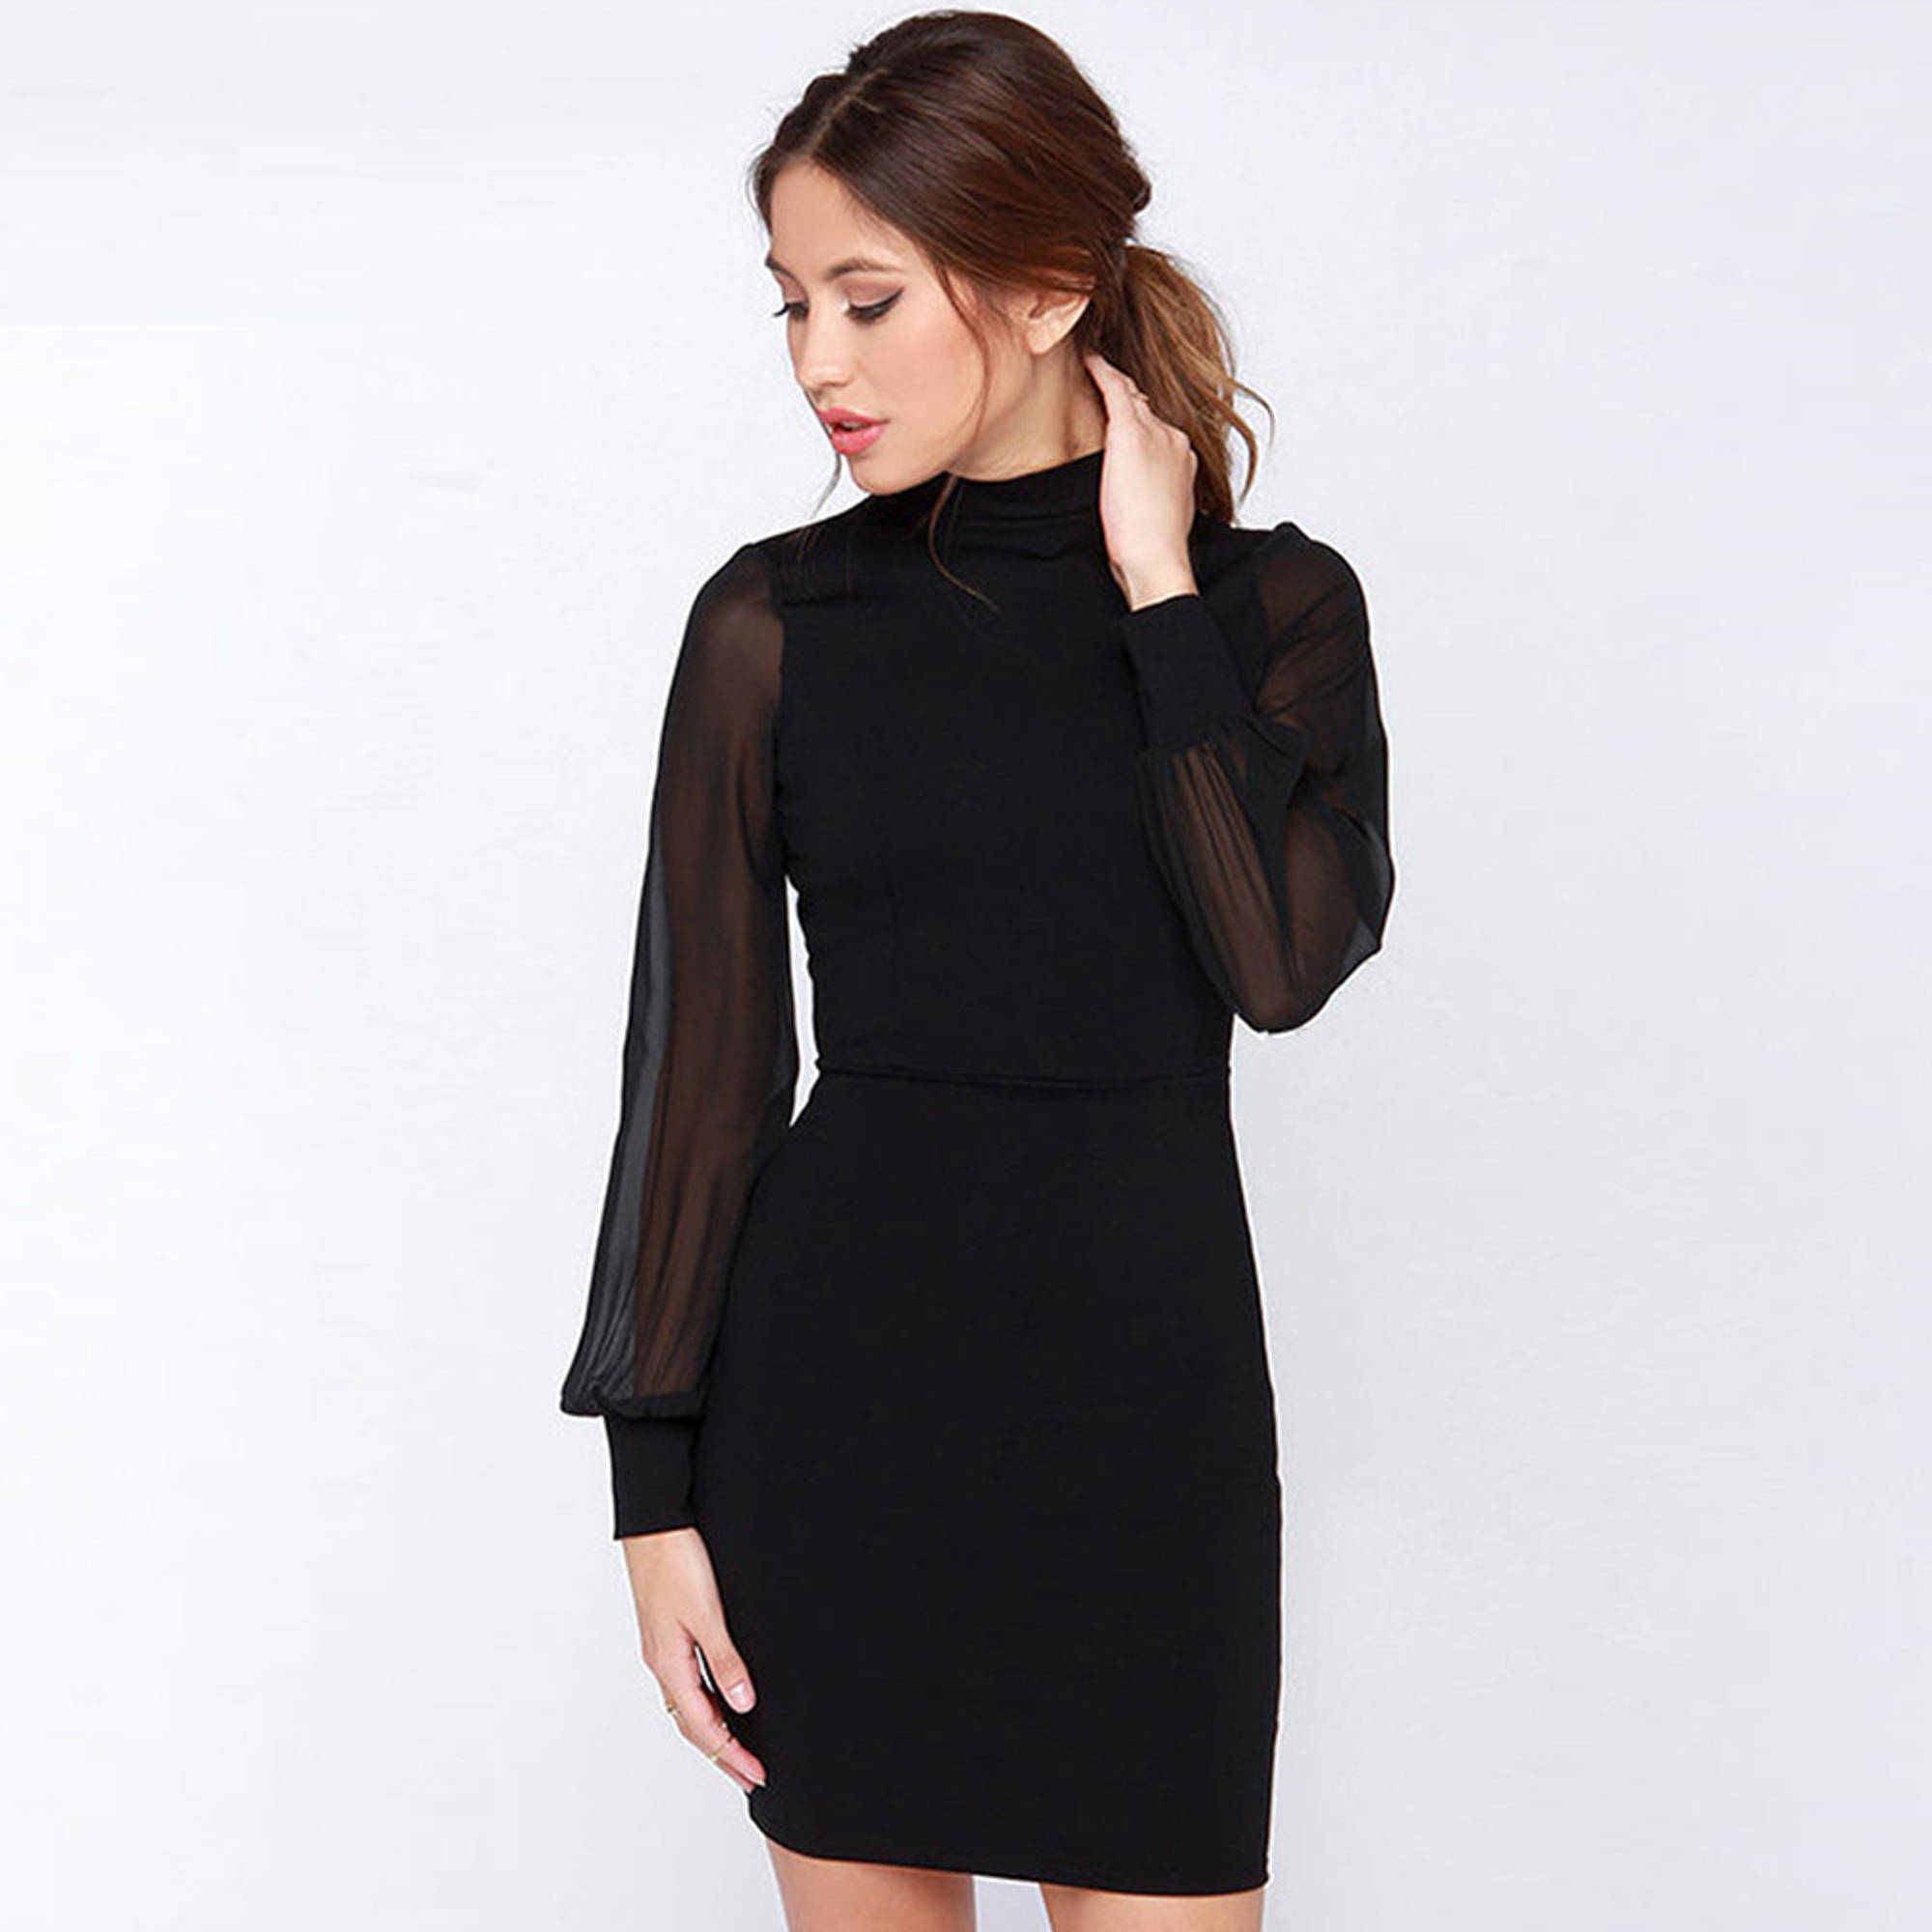 Women Long Sleeve Backless Slim Solid Bodycon Pencil Bandage Dress